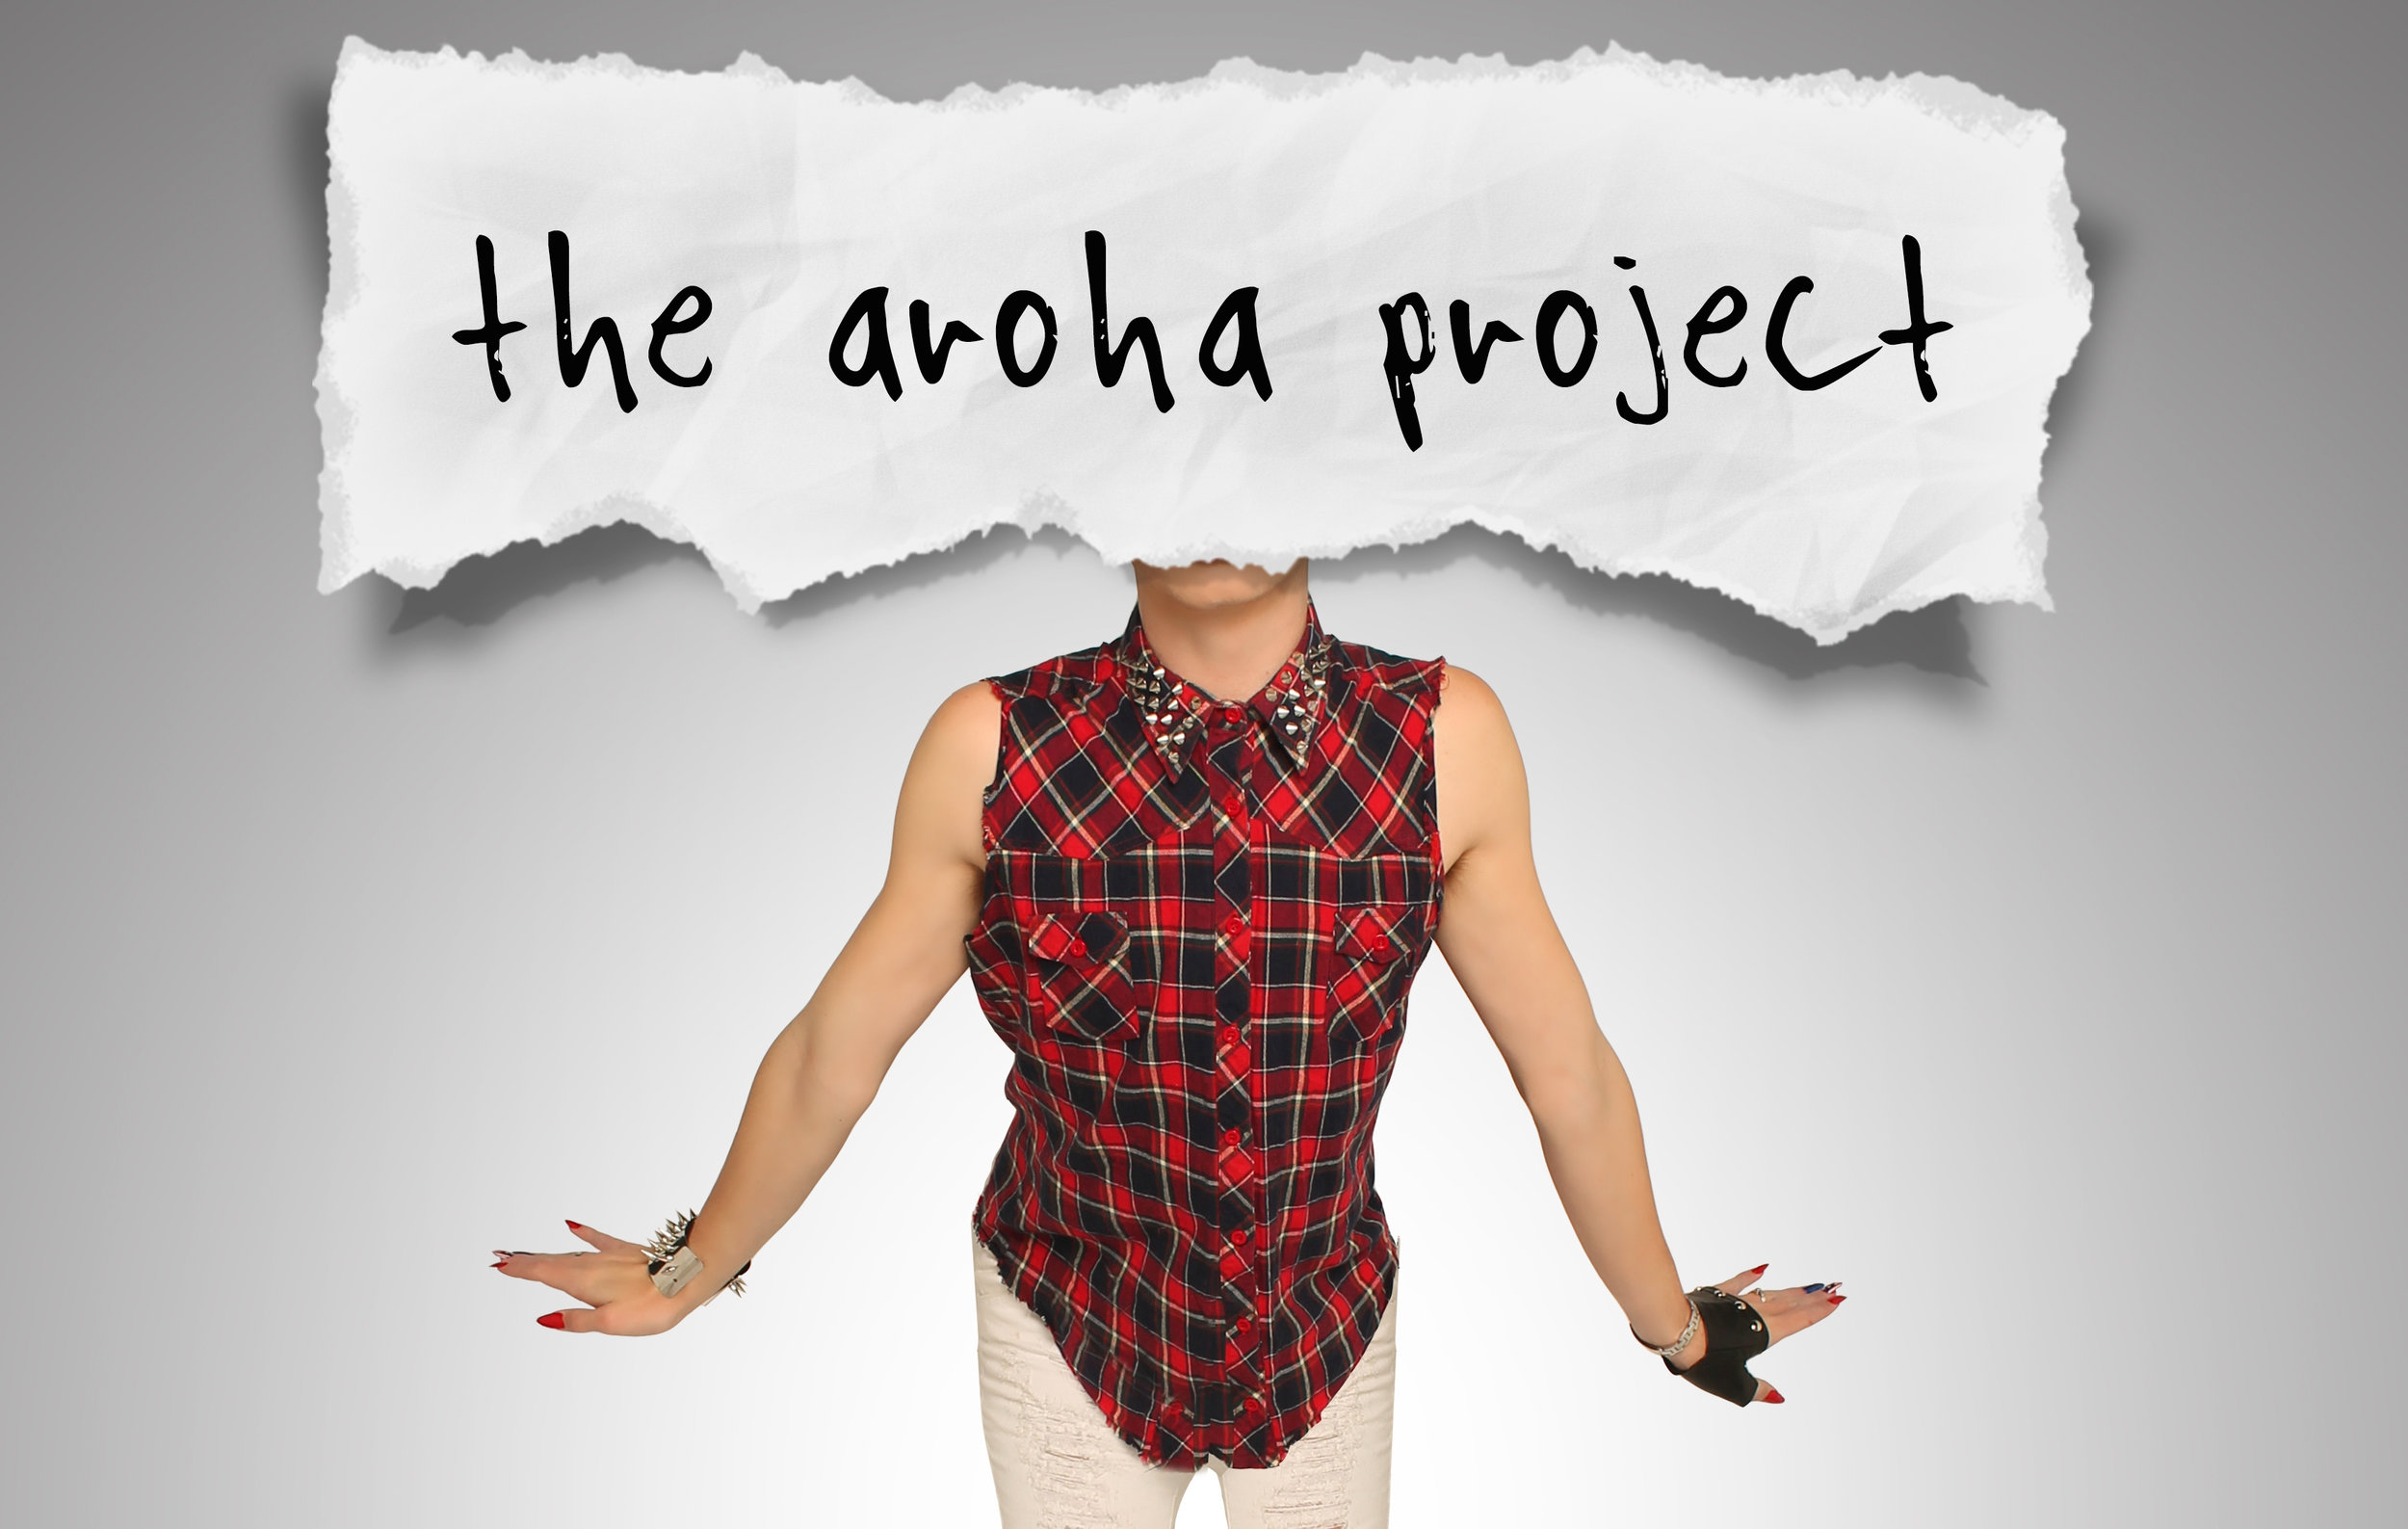 THE-AROHA-PROJECT-Basement